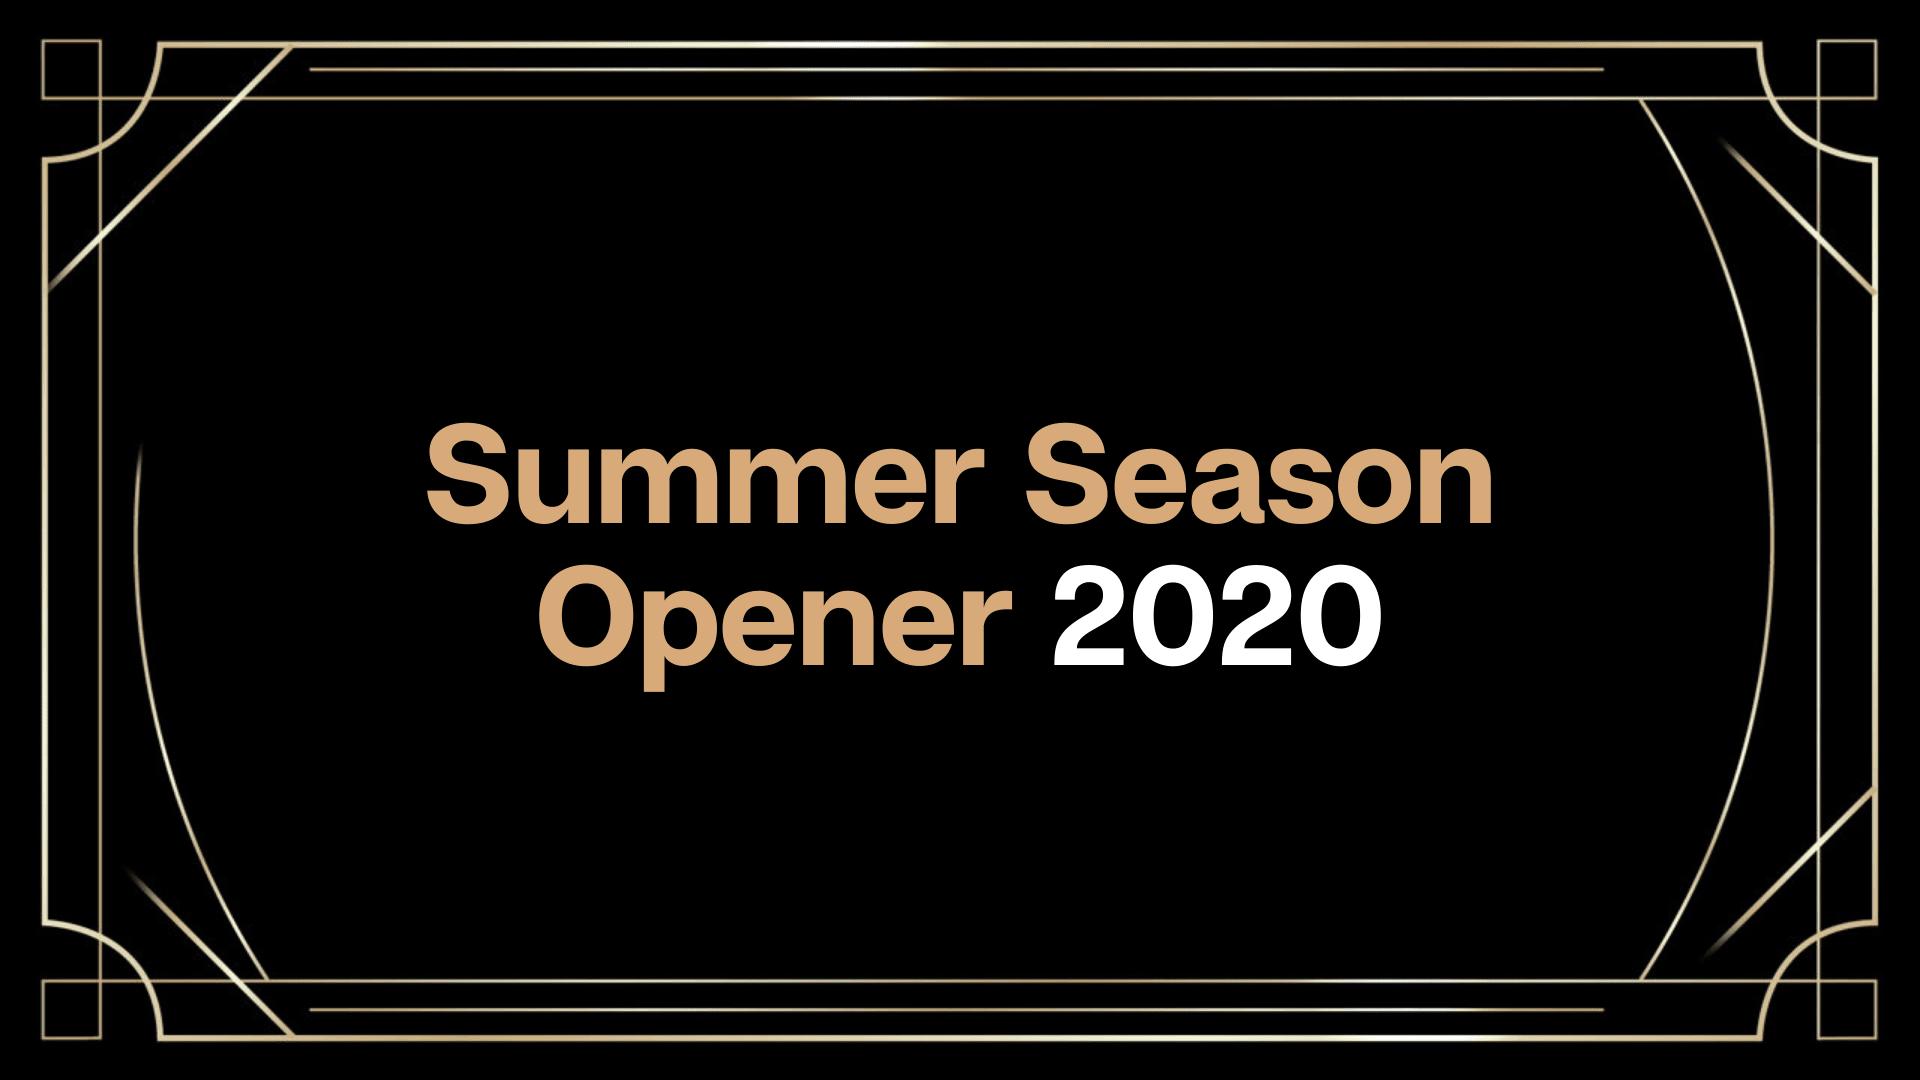 Copy of Community Season Opener 2020 (1)